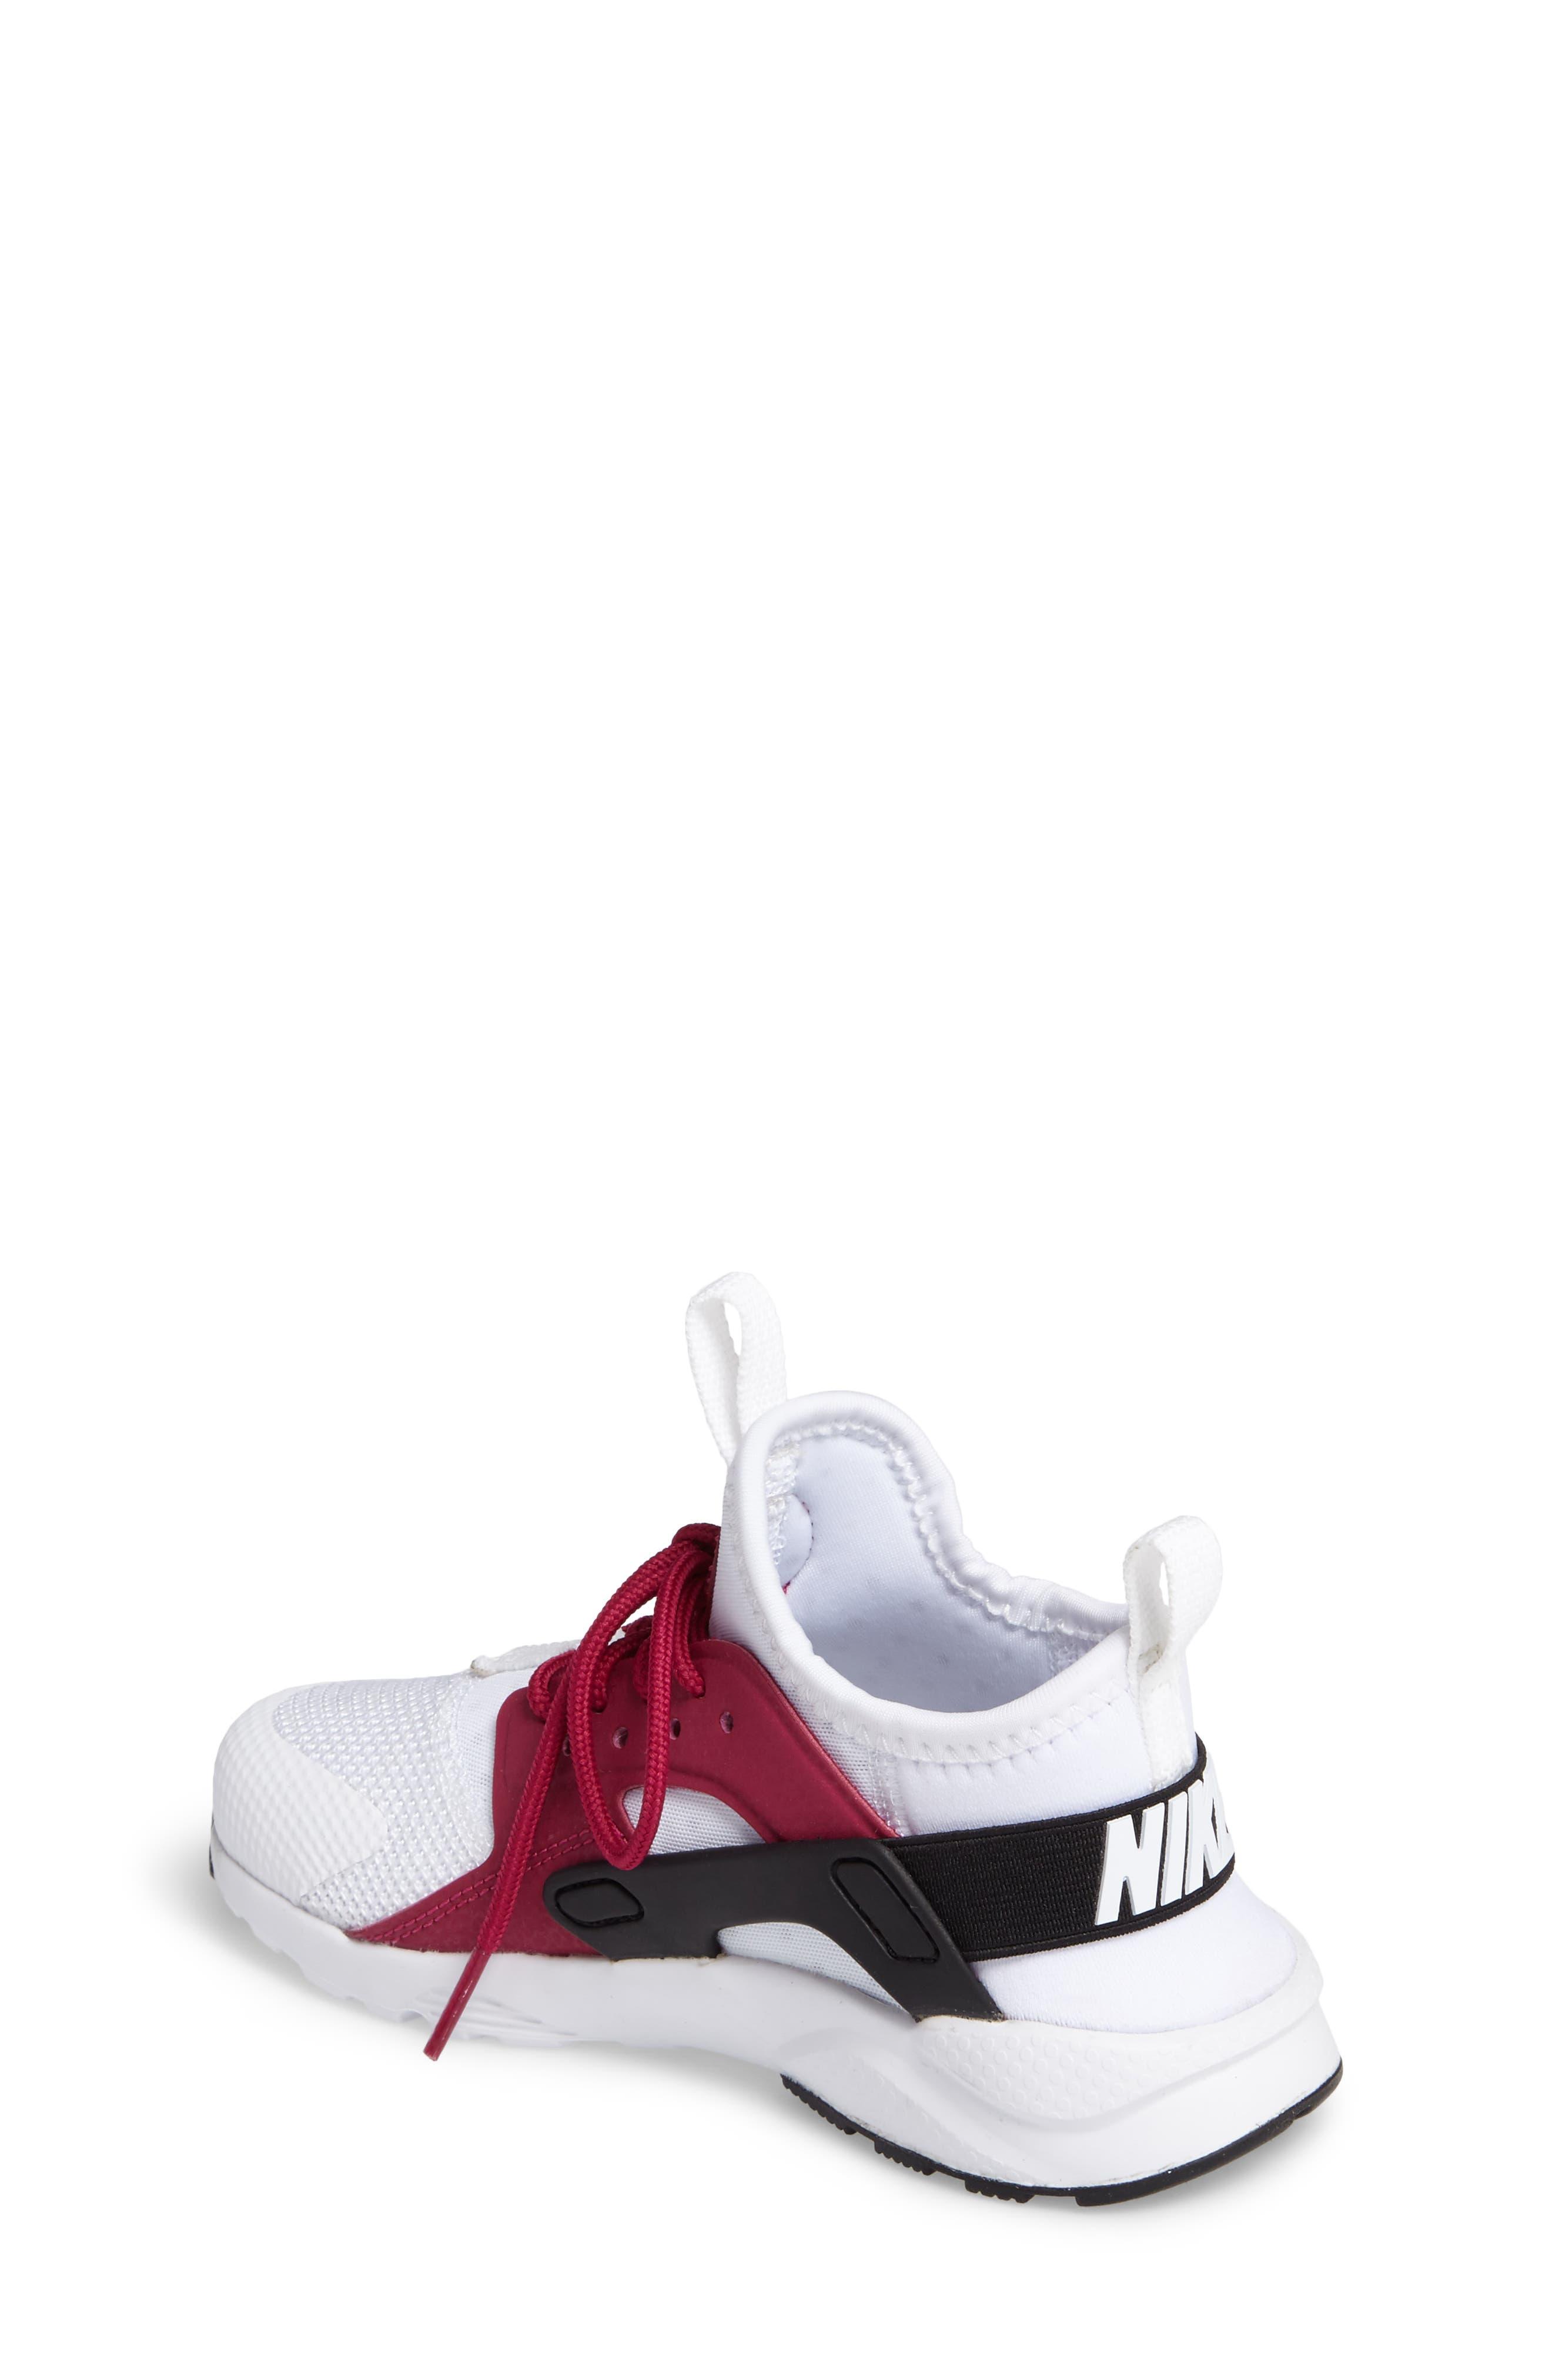 Air Huarache Run Ultra Sneaker,                             Alternate thumbnail 2, color,                             White/ Sport Fuchsia/ Black